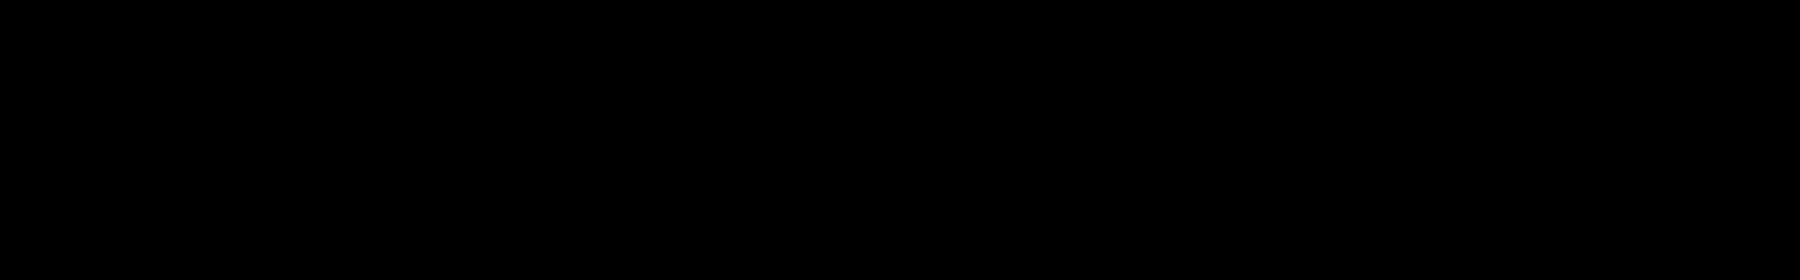 Masive X Dark Ambient audio waveform